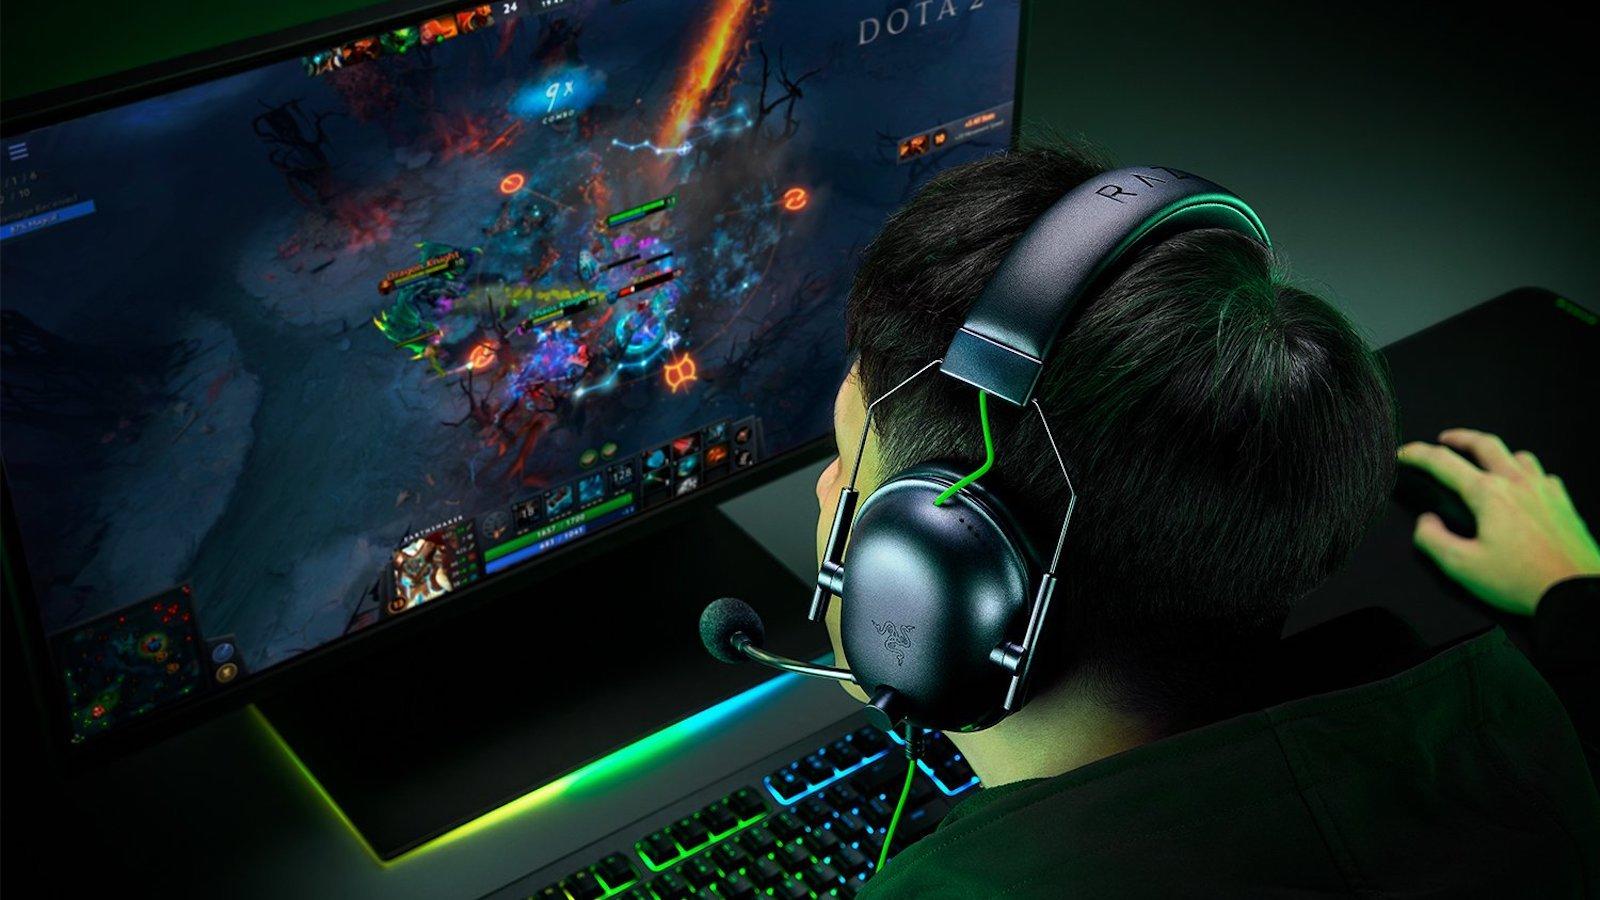 Razer BlackShark V2 X wired gaming headset offers noise cancellation